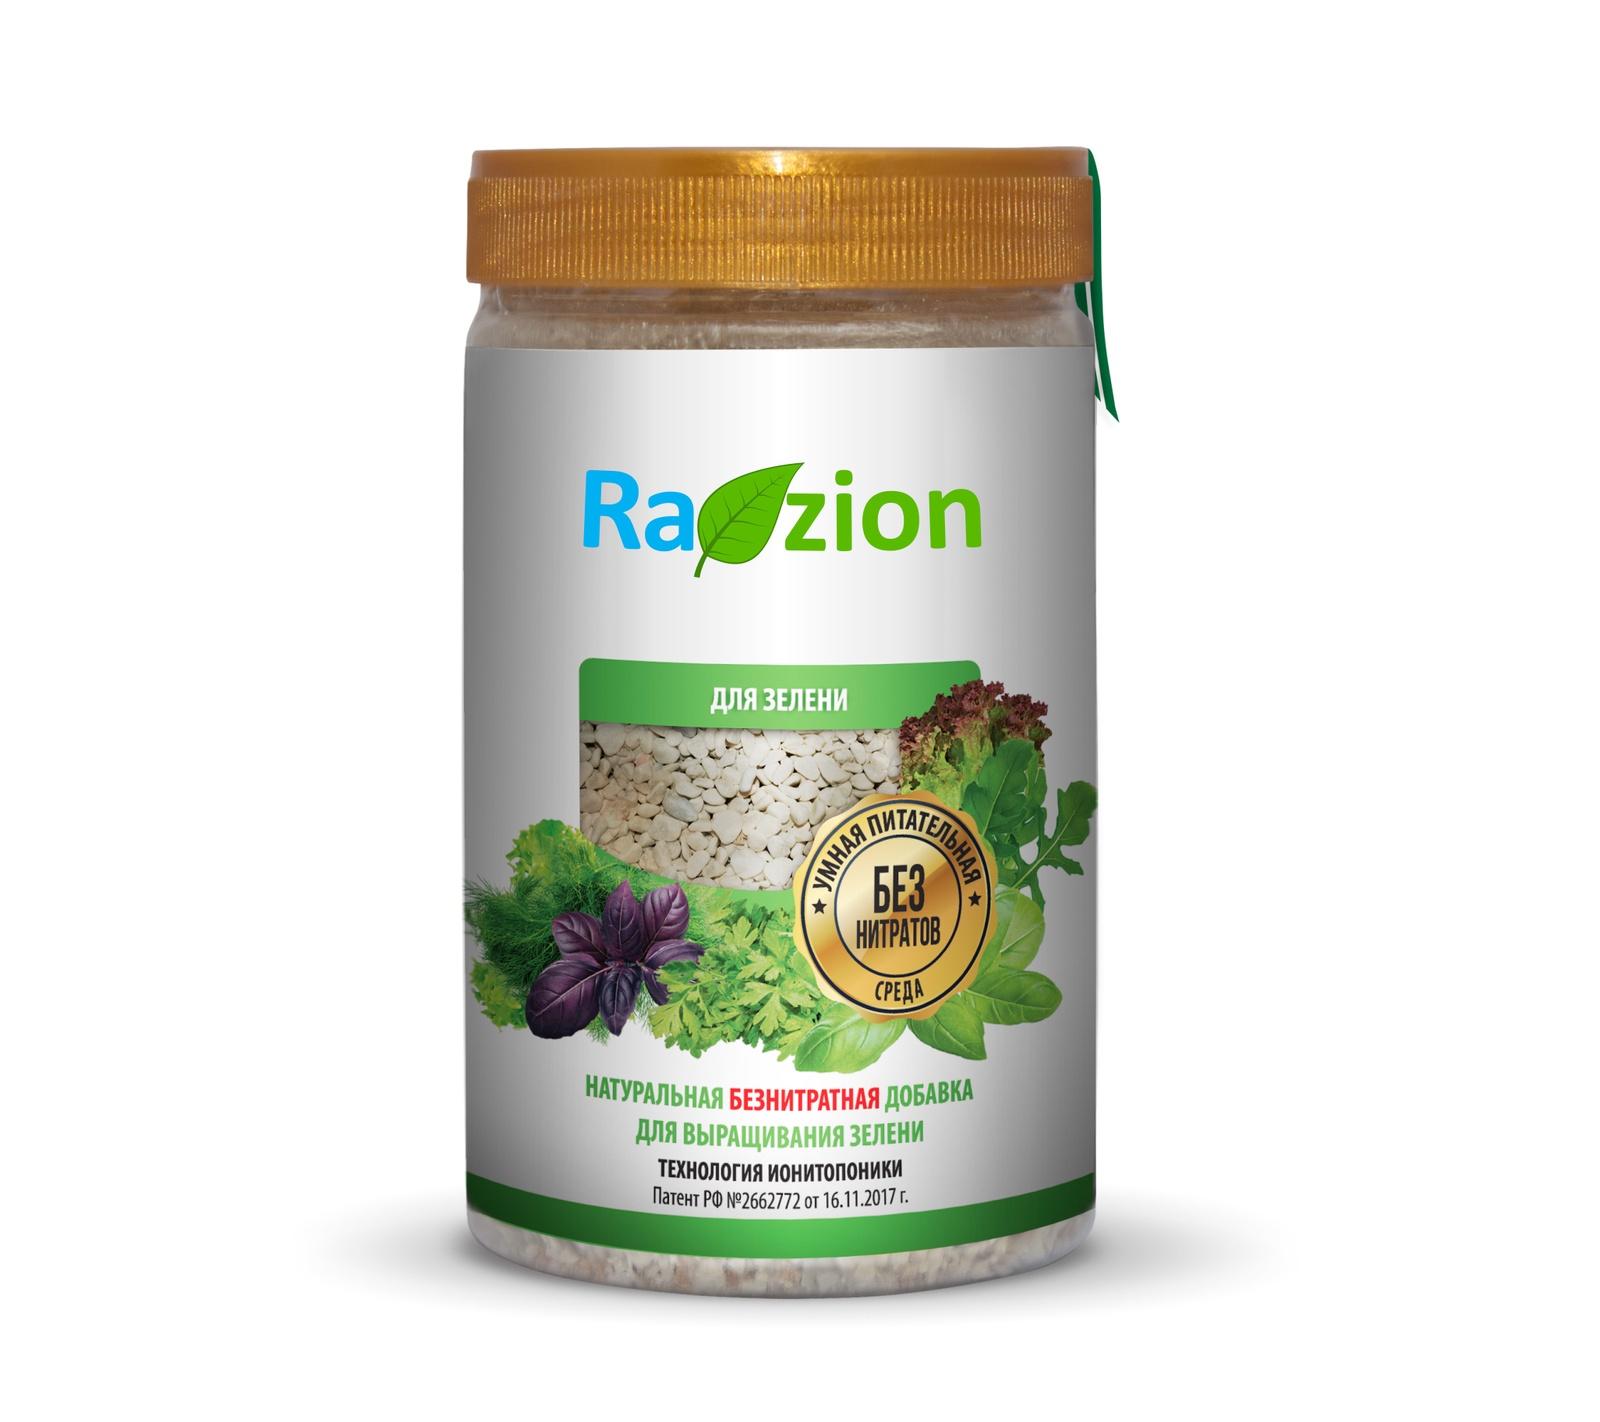 Удобрение RAZION для зелени (лука, укропа, петрушки и др.). Улучшитель грунта